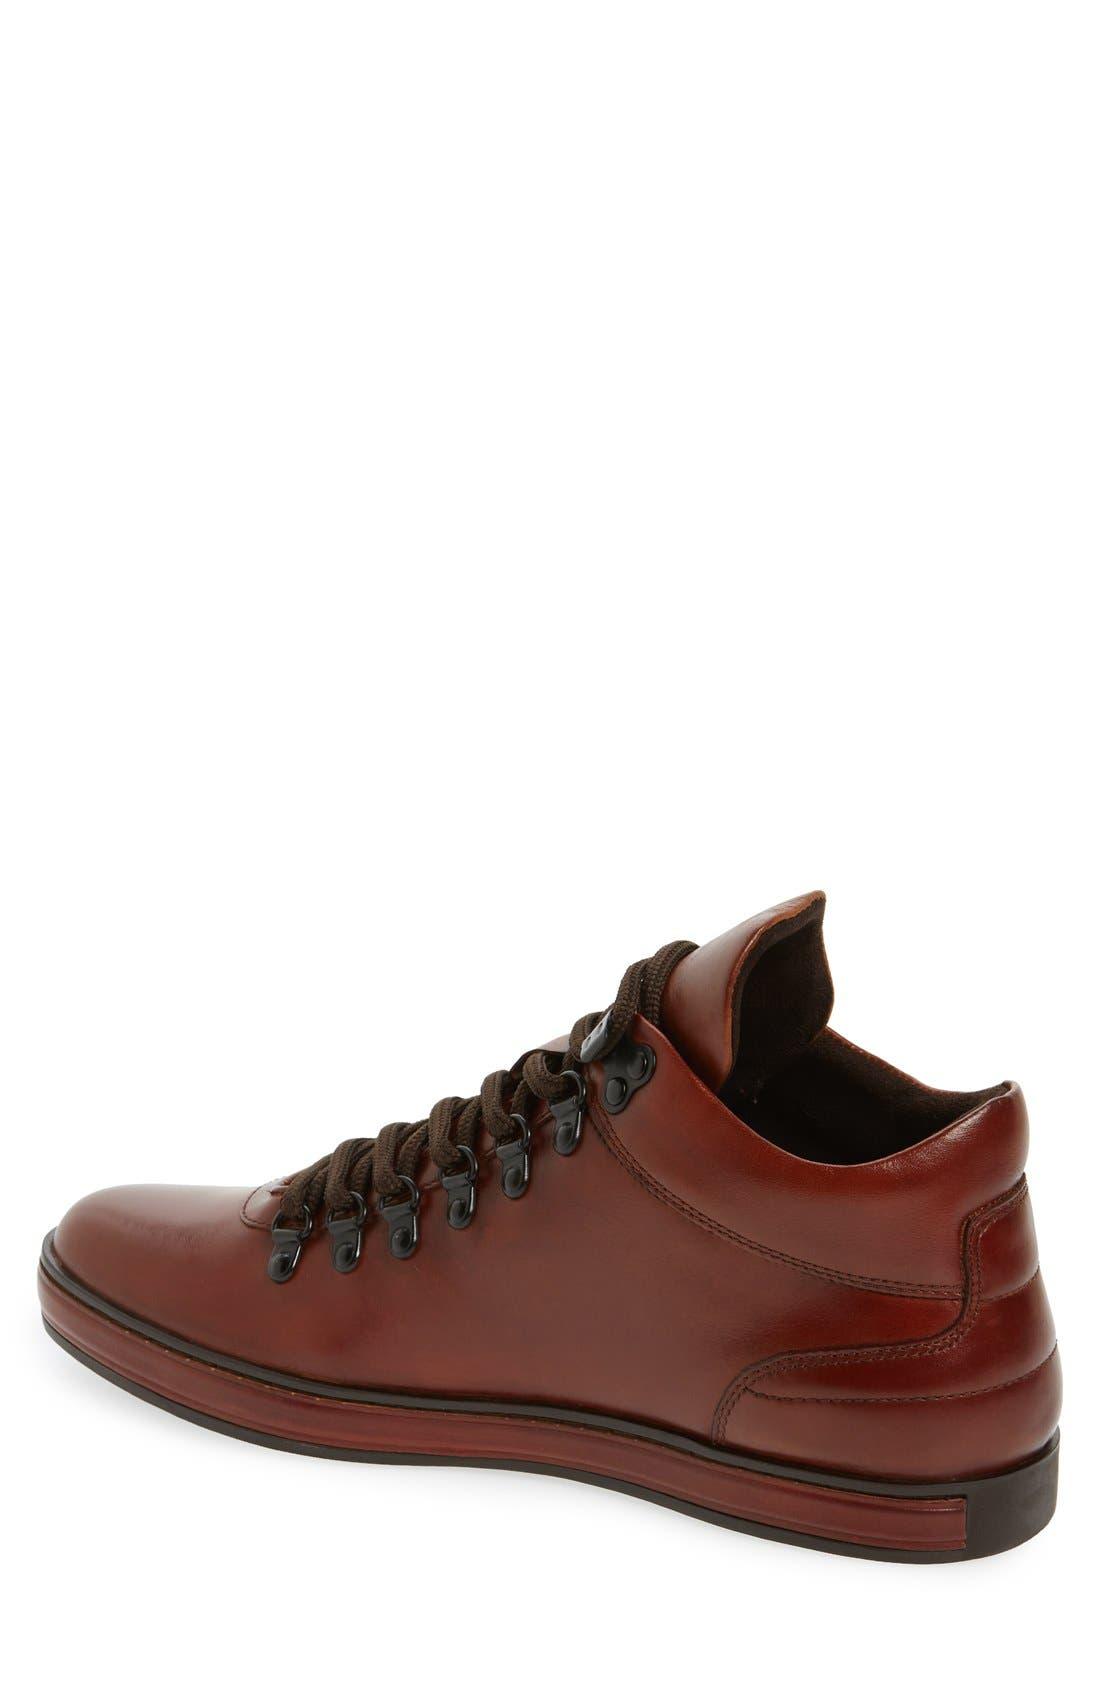 'Brand Tour' Sneaker,                             Alternate thumbnail 3, color,                             227